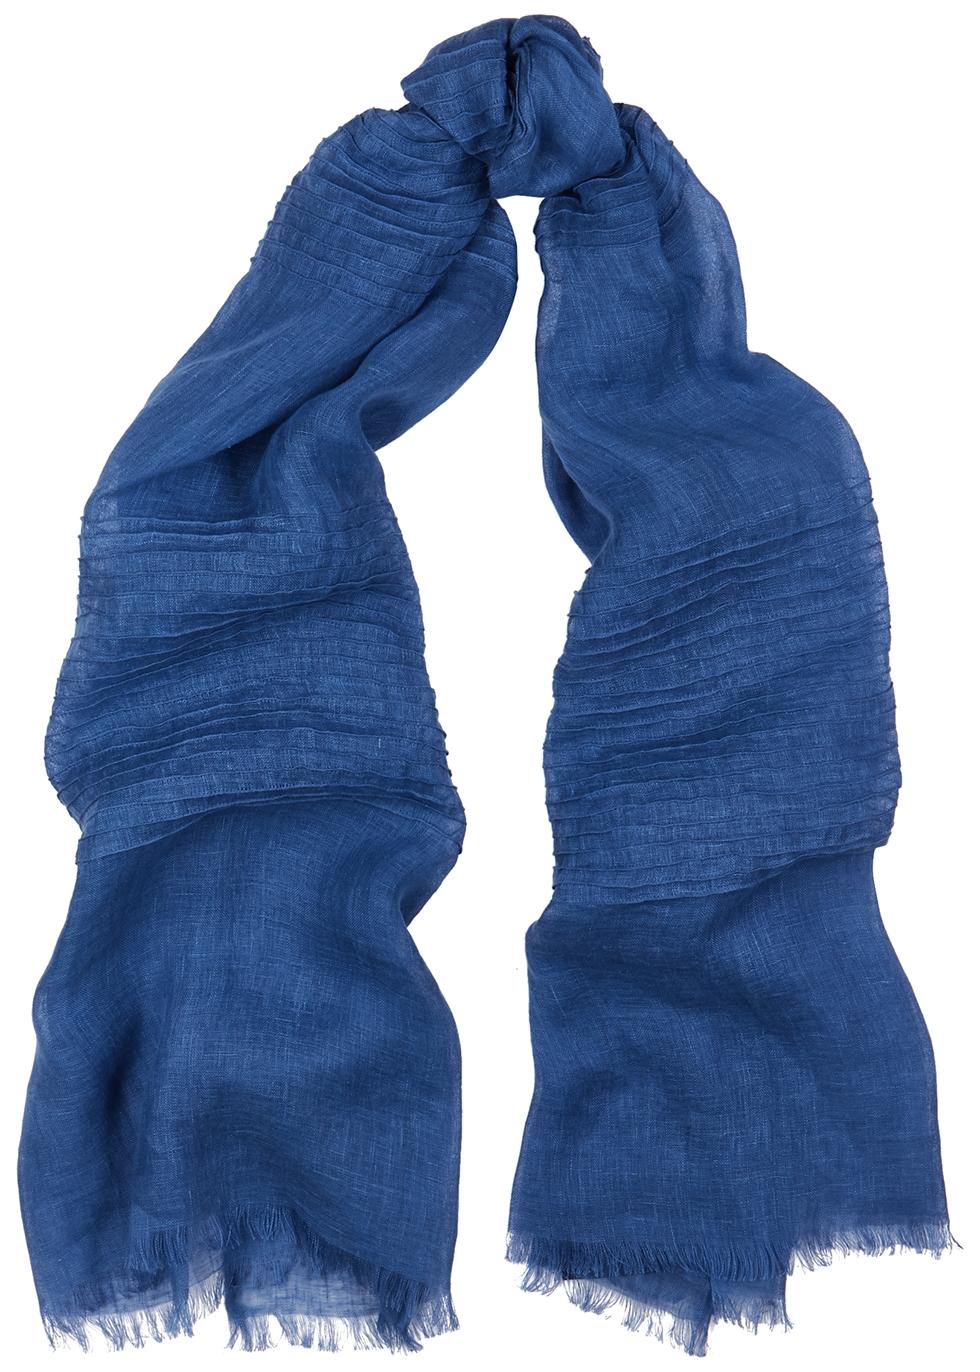 Blue linen gauze scarf